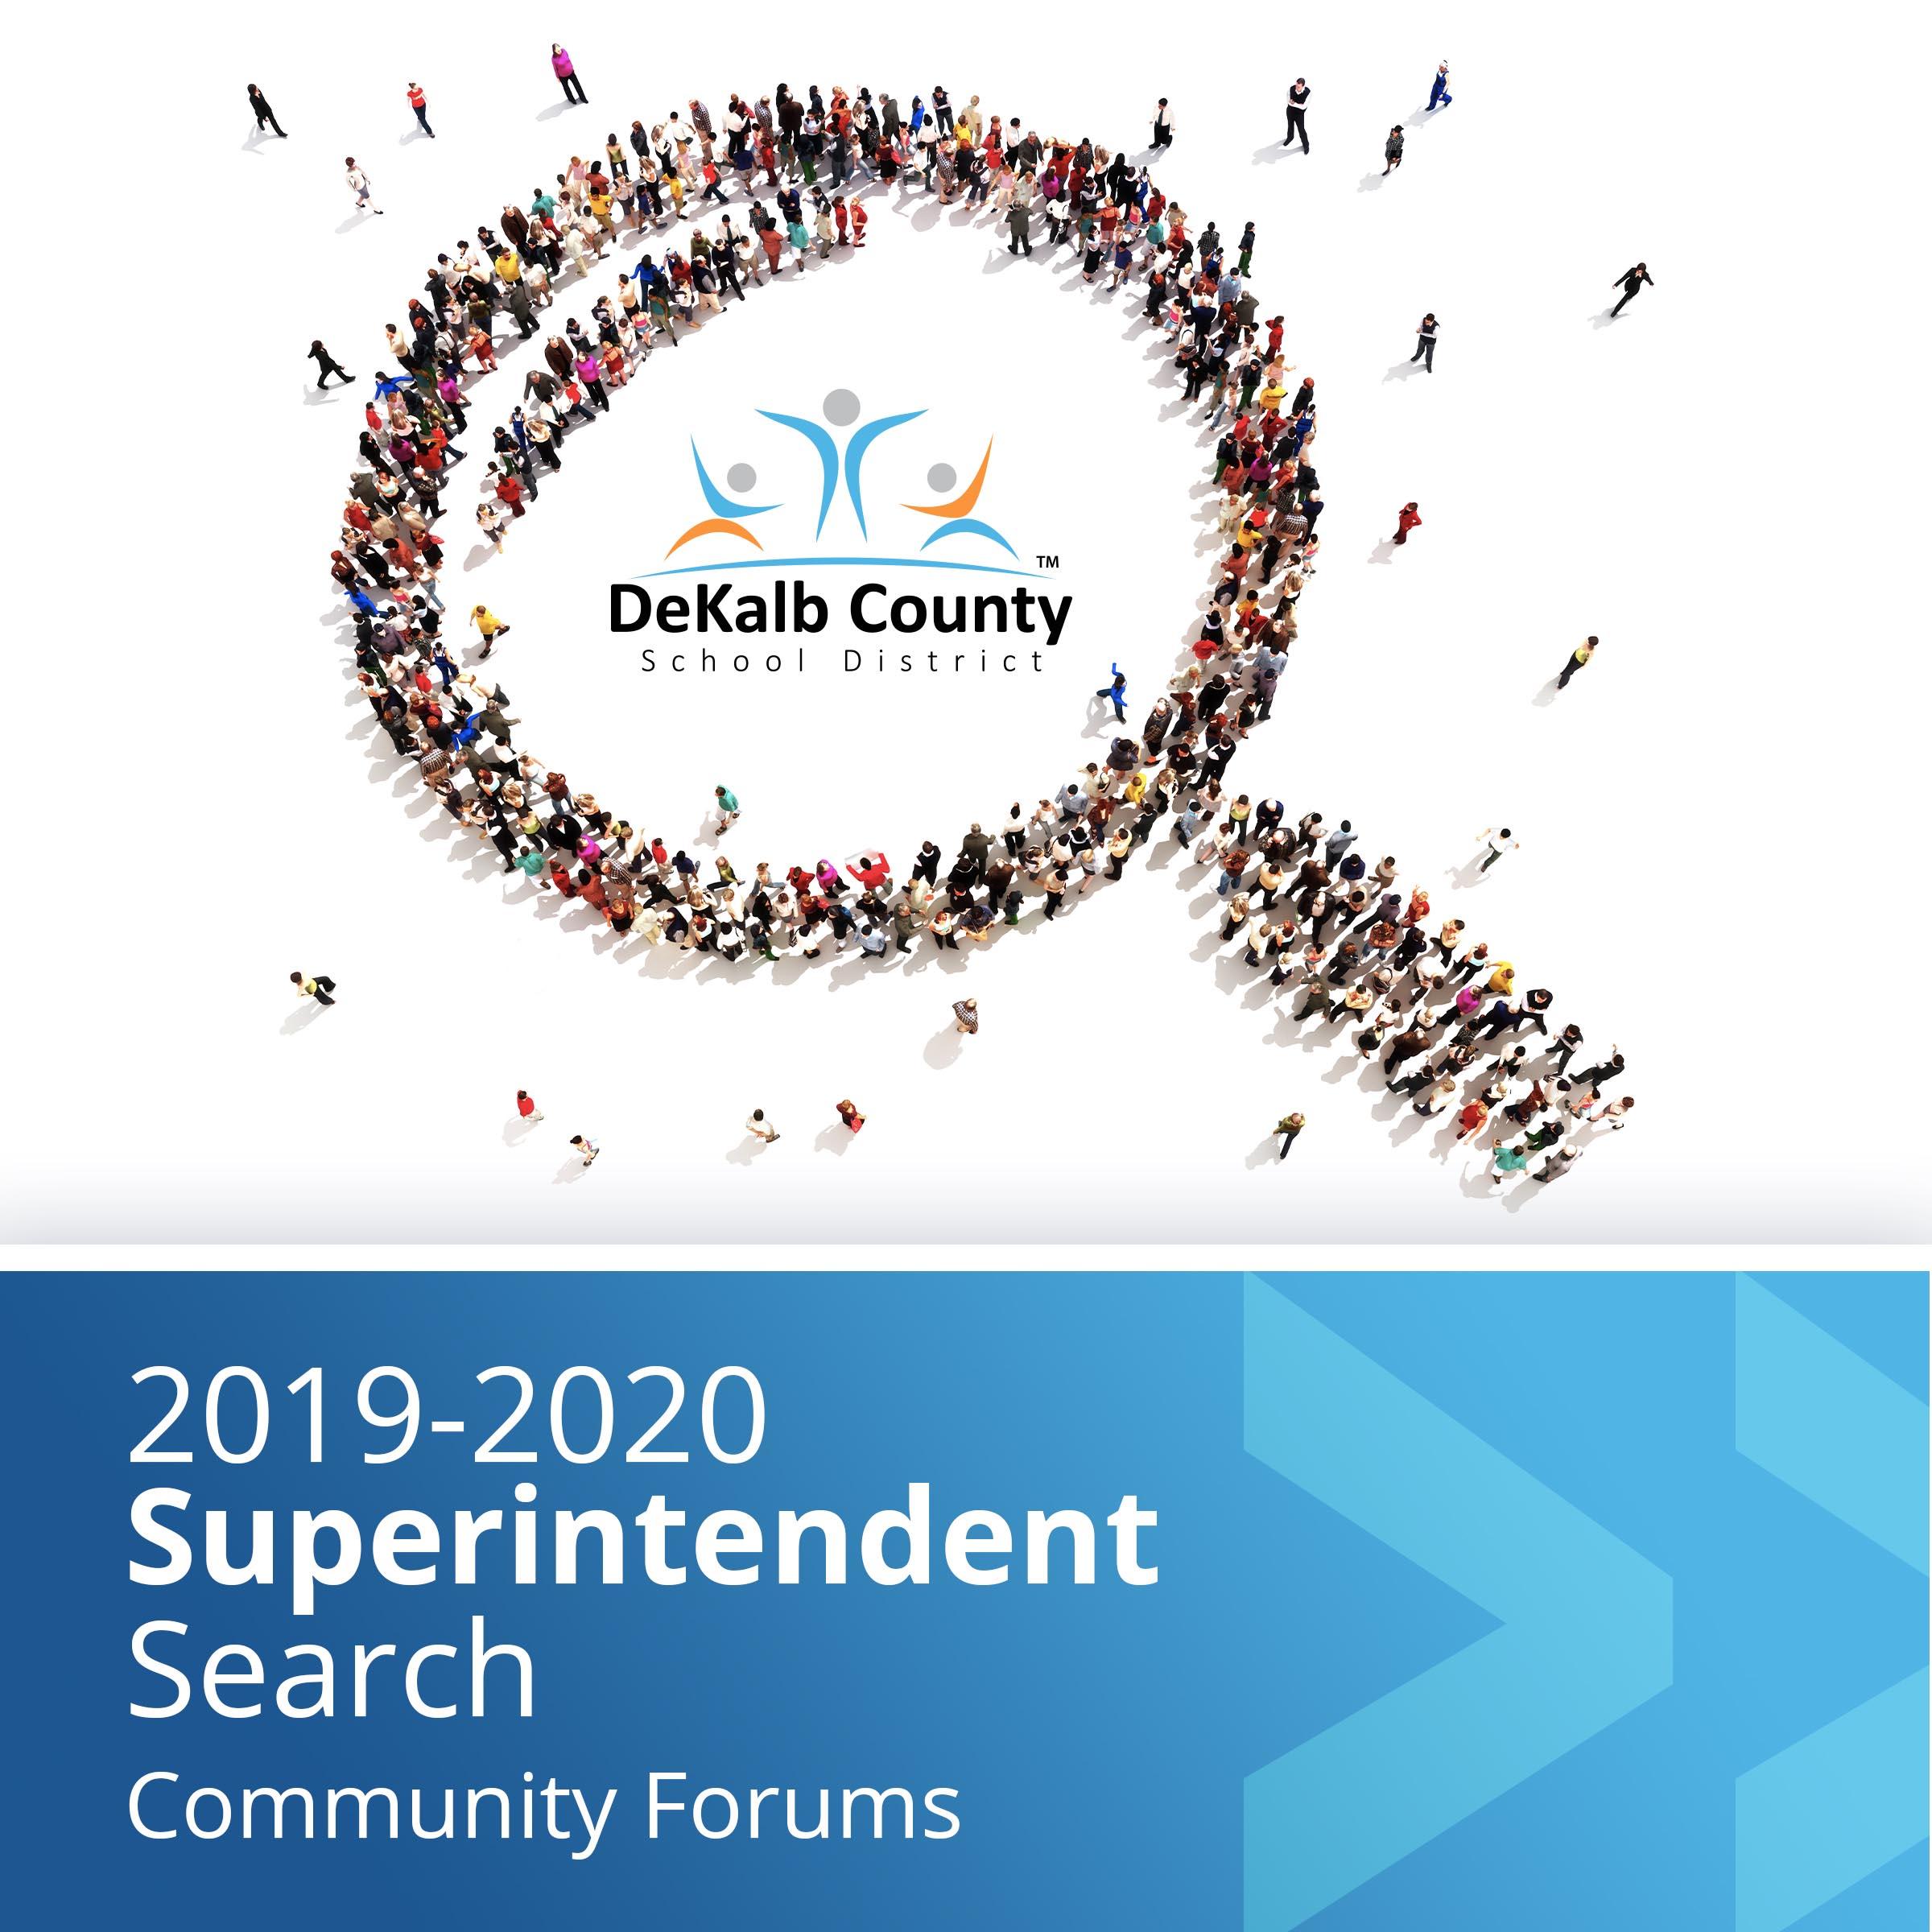 Superintendent Search Community Forum square